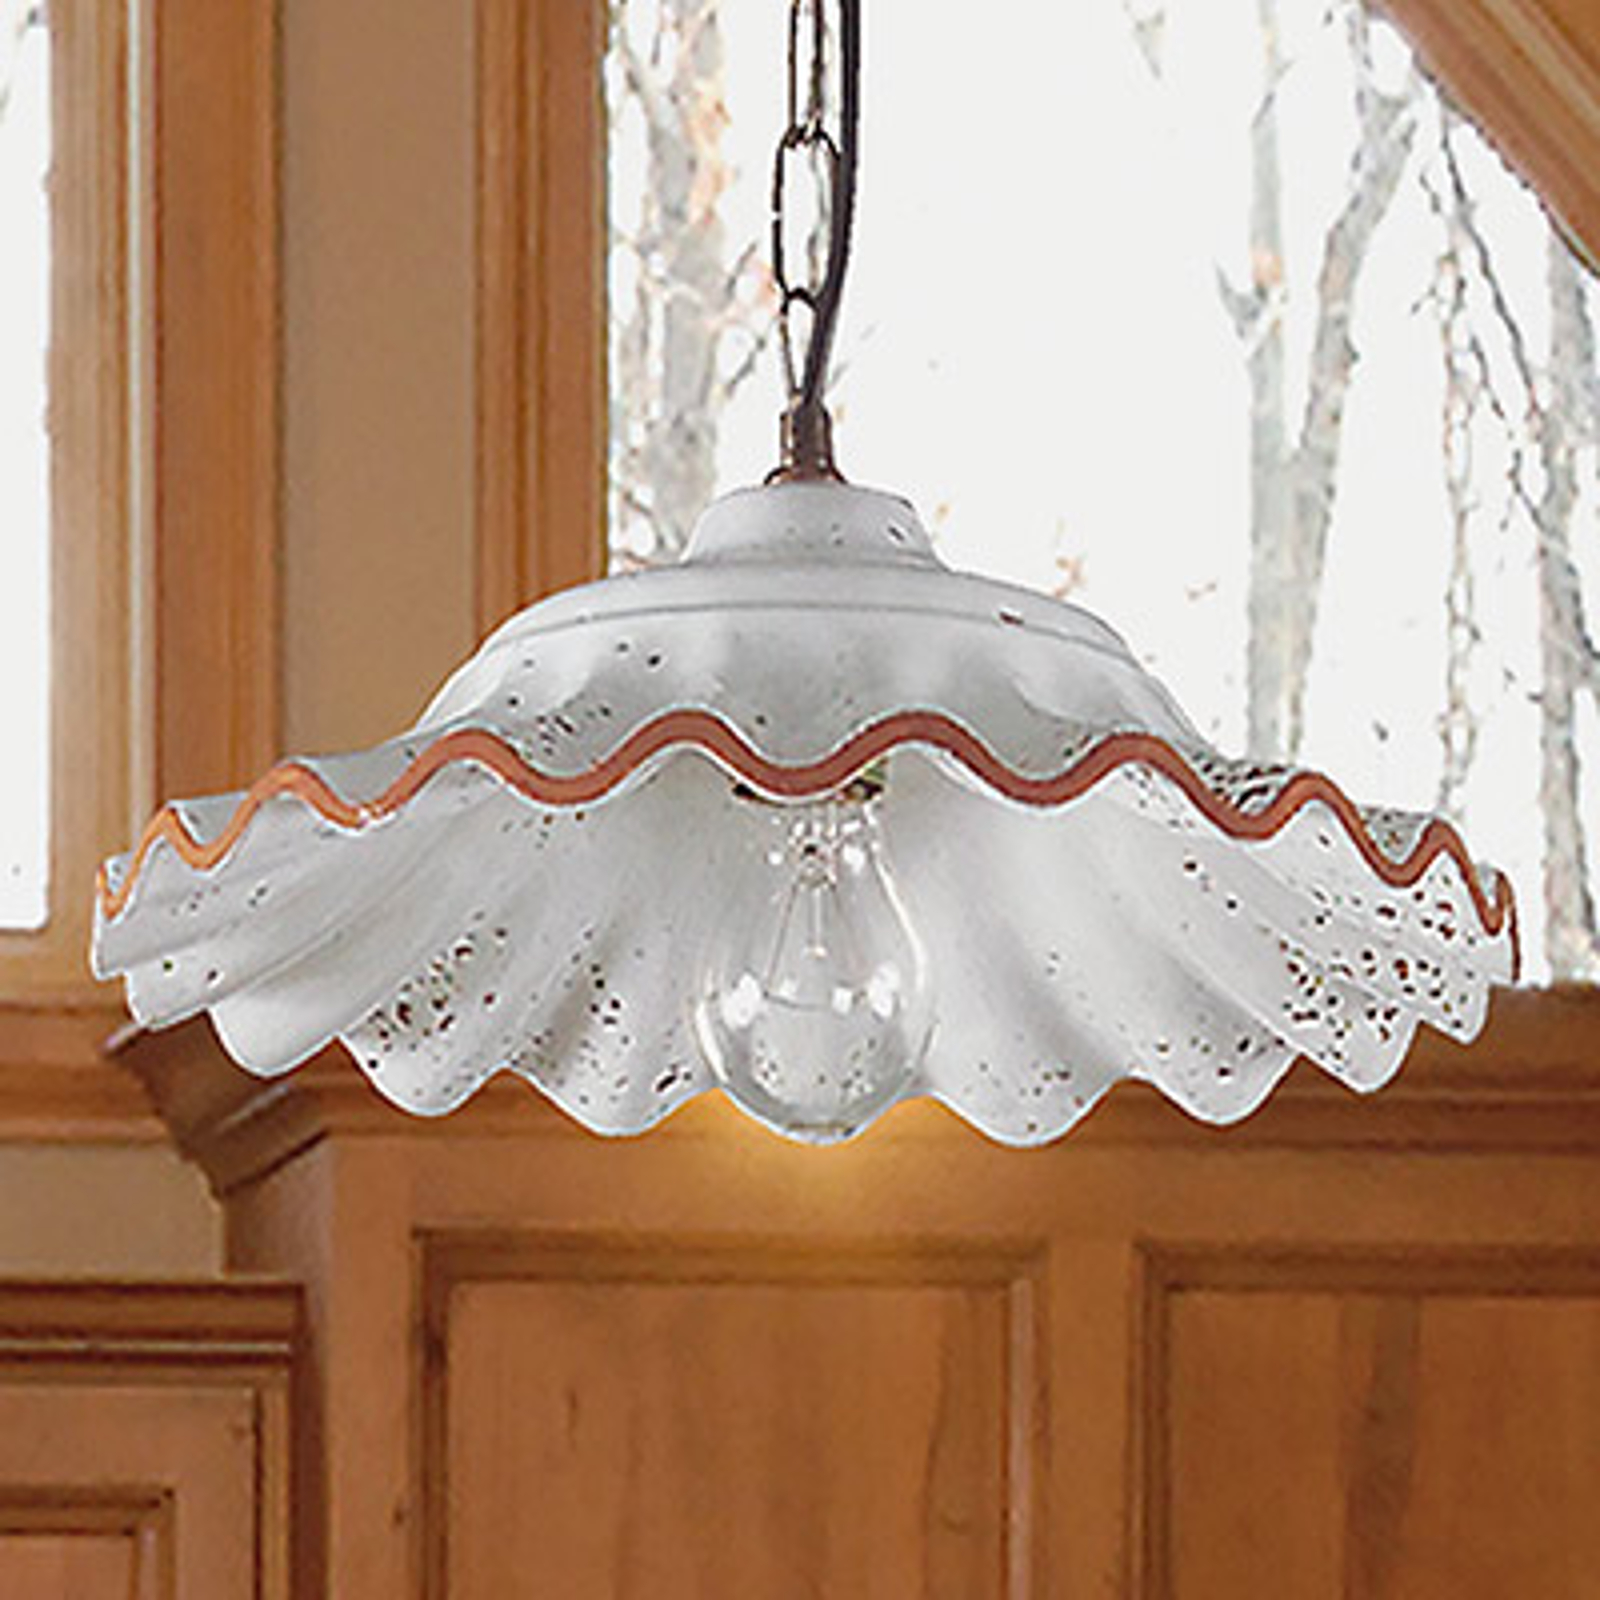 Závěsné světlo Tarlo, keramické stínidlo